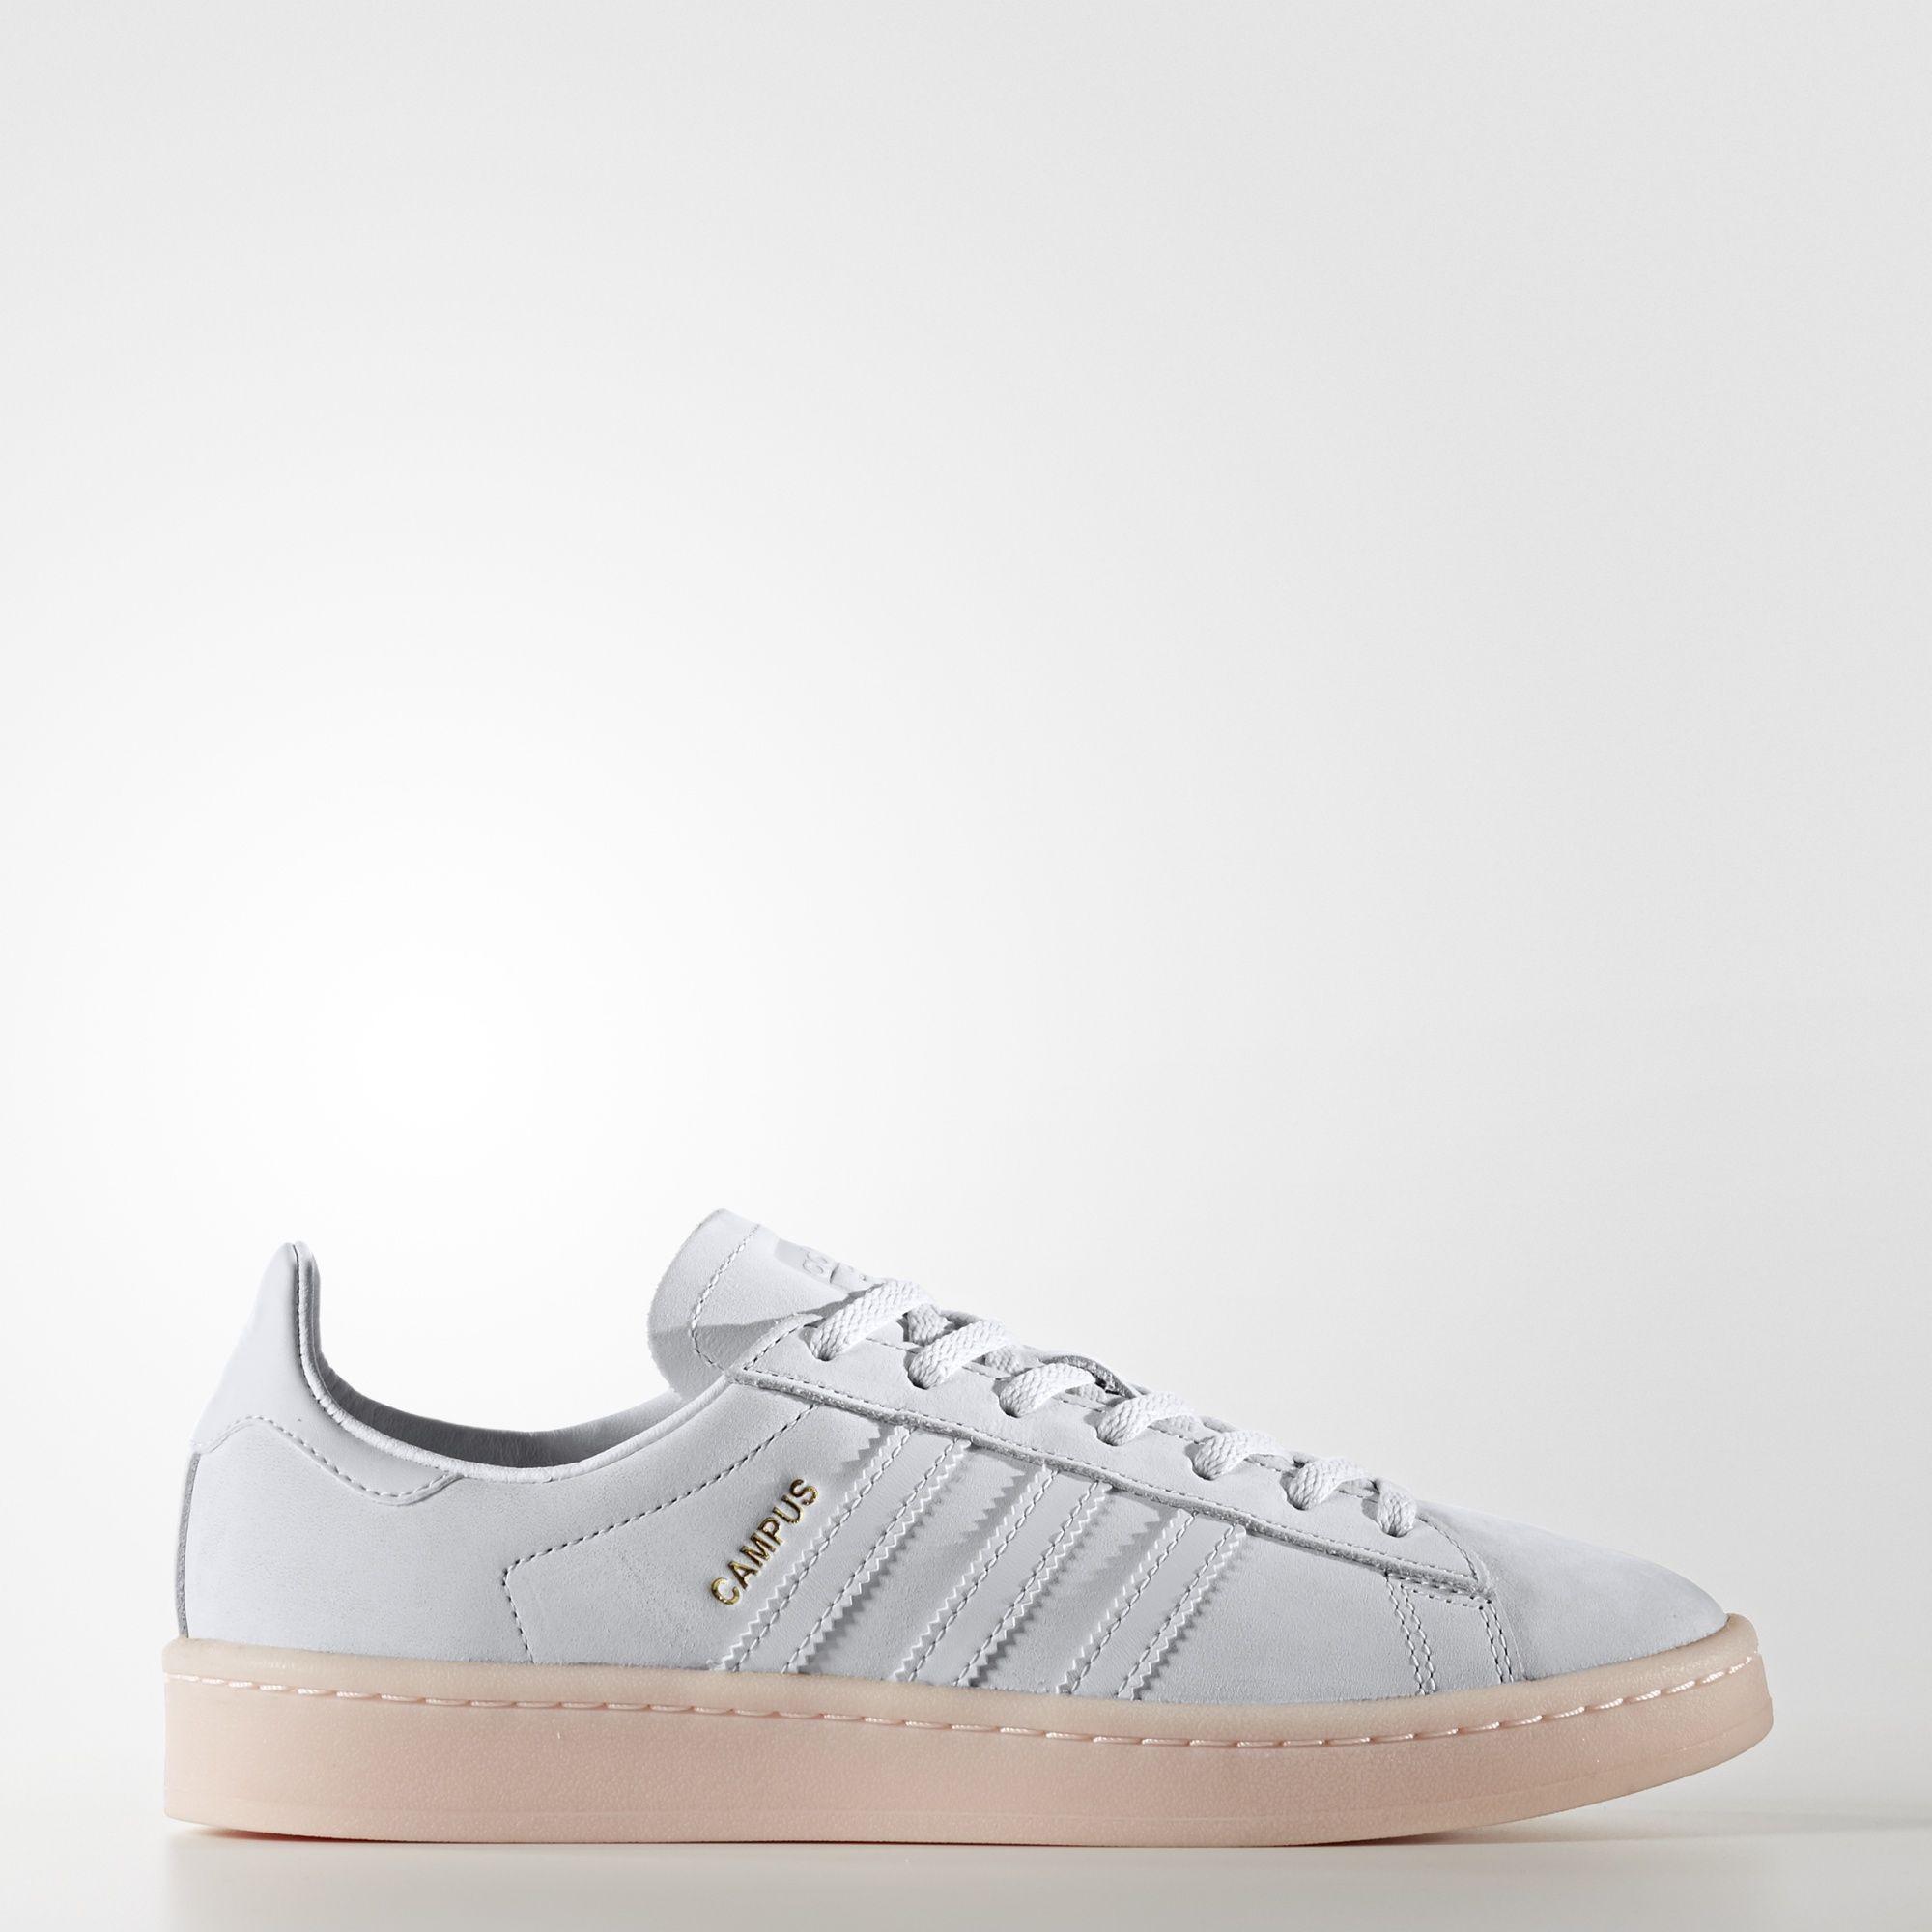 adidas - Campus Shoes | Adidas campus shoes, Adidas campus ...